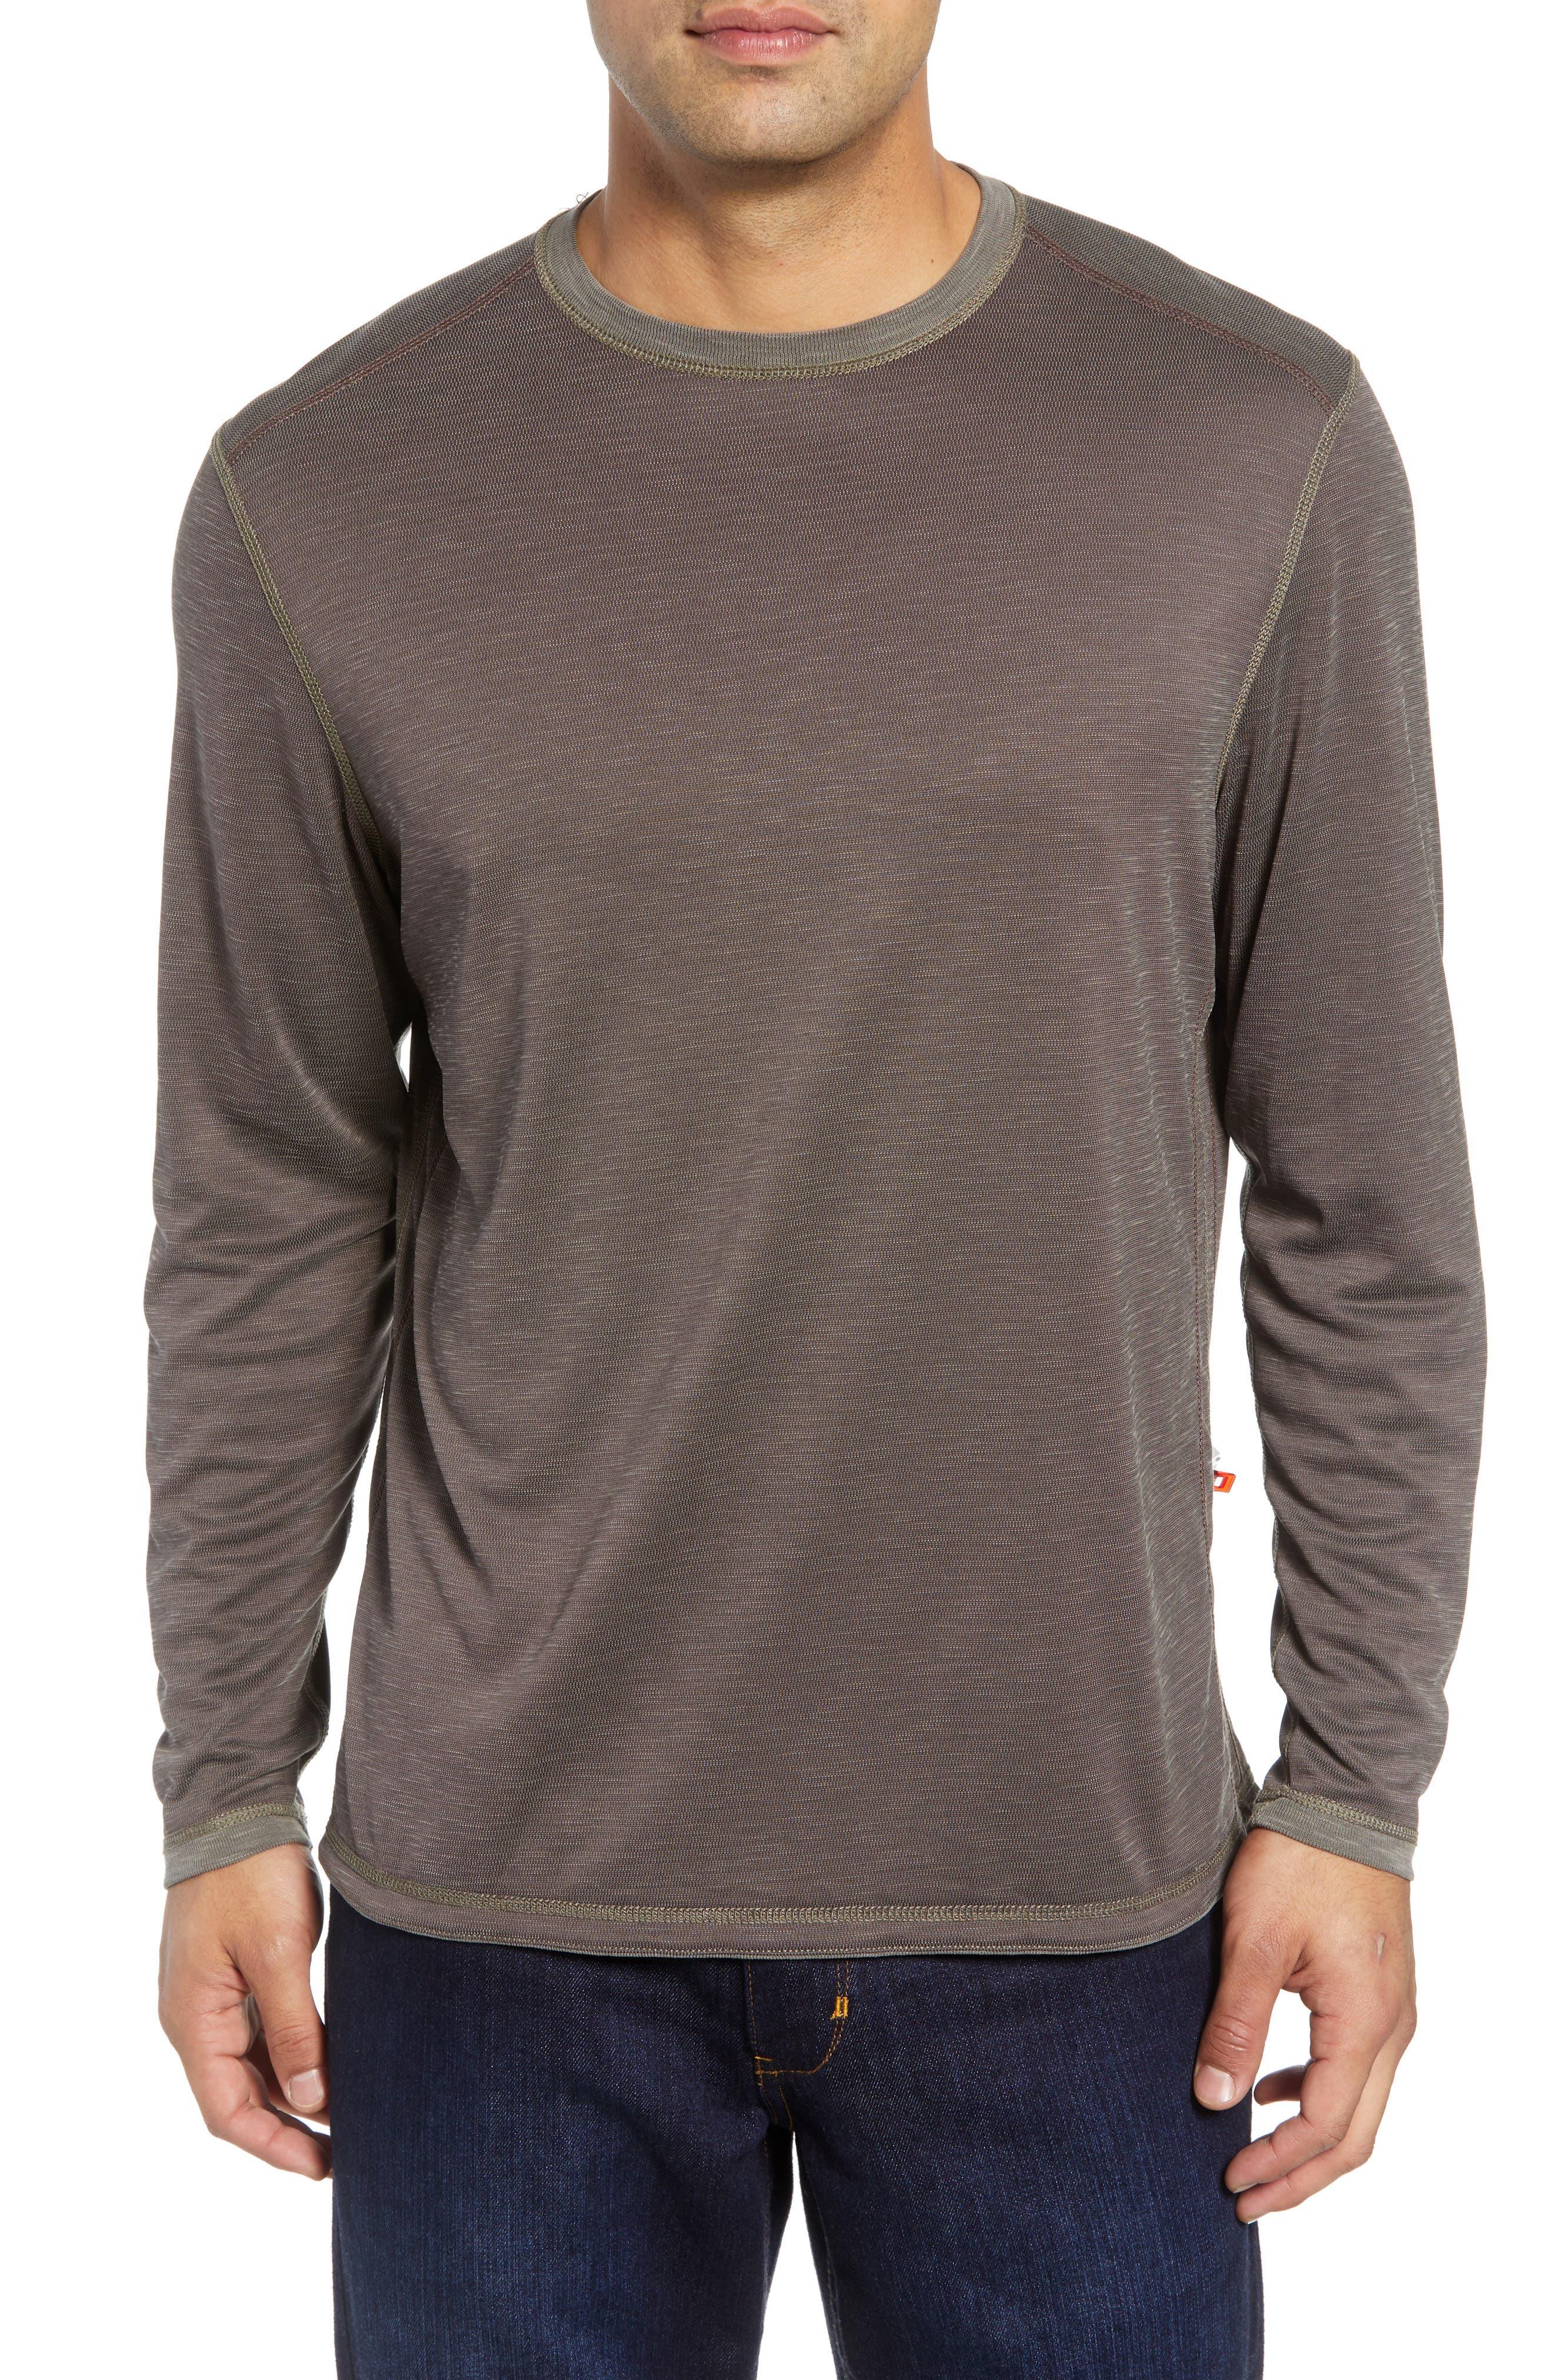 Flip Tide Standard Fit T-Shirt,                             Alternate thumbnail 2, color,                             BITTERSWEET CHOCOLATE